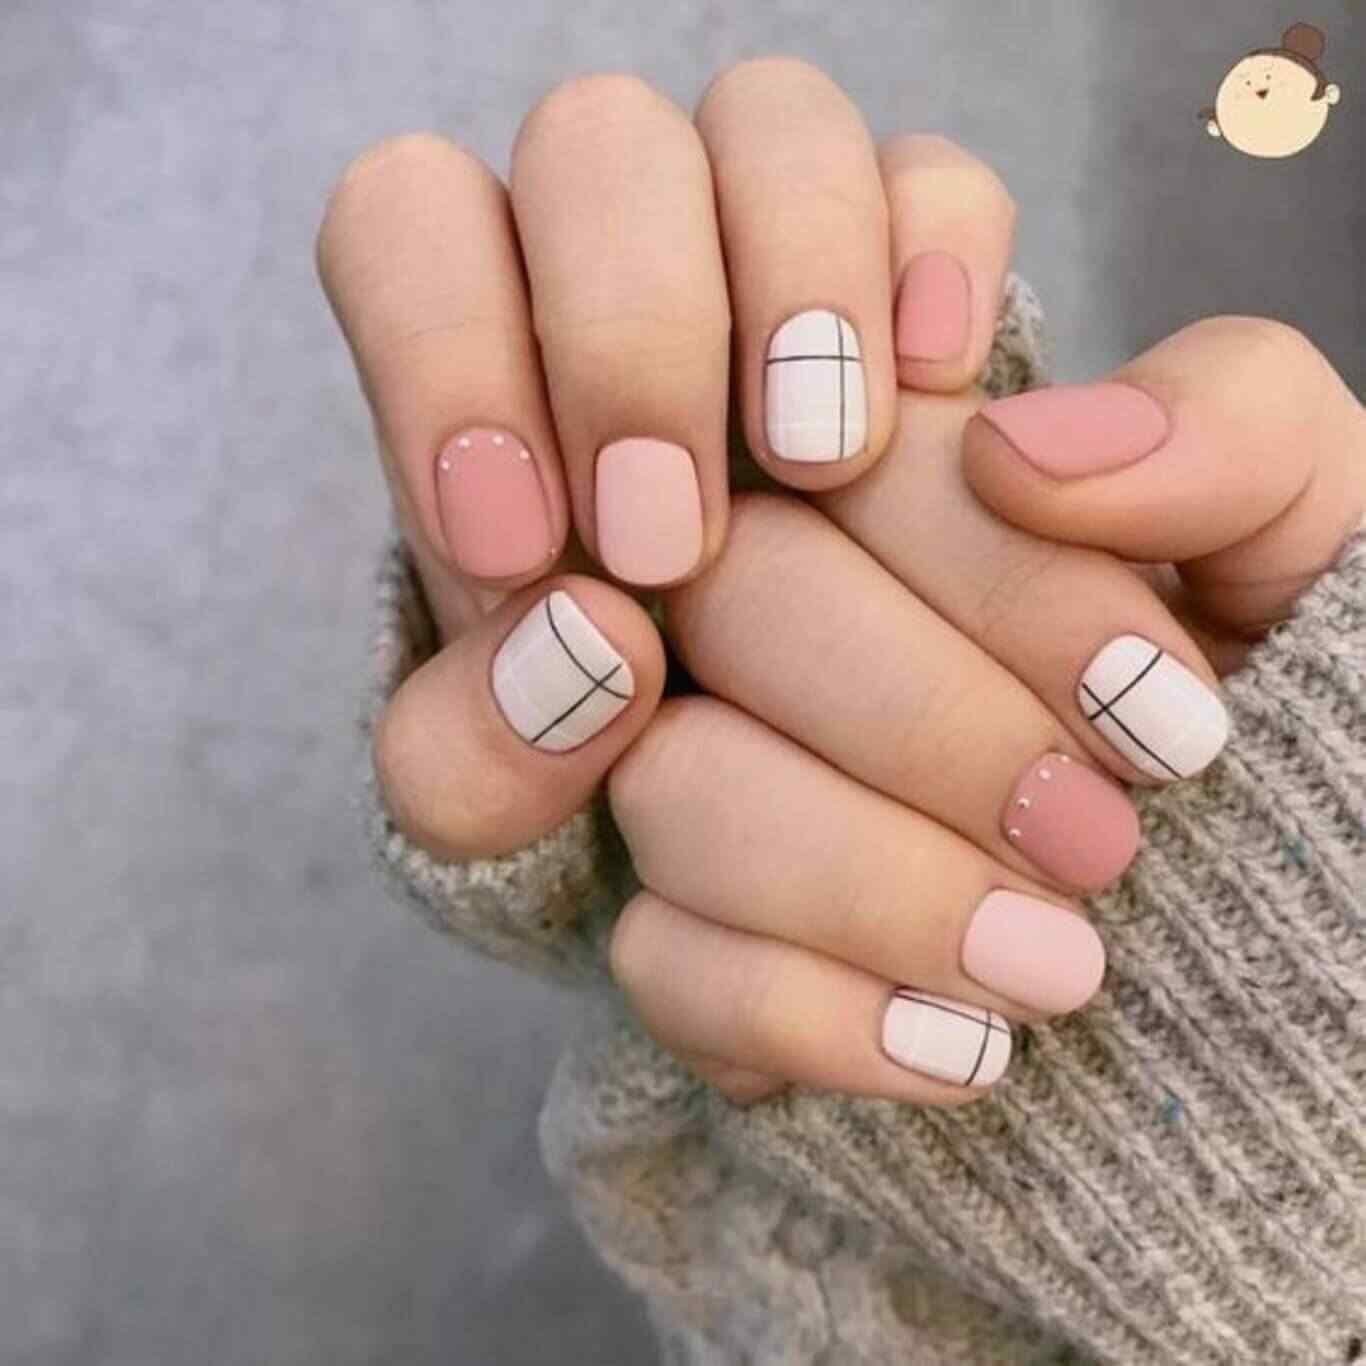 diseño facil de uñas rosa palo